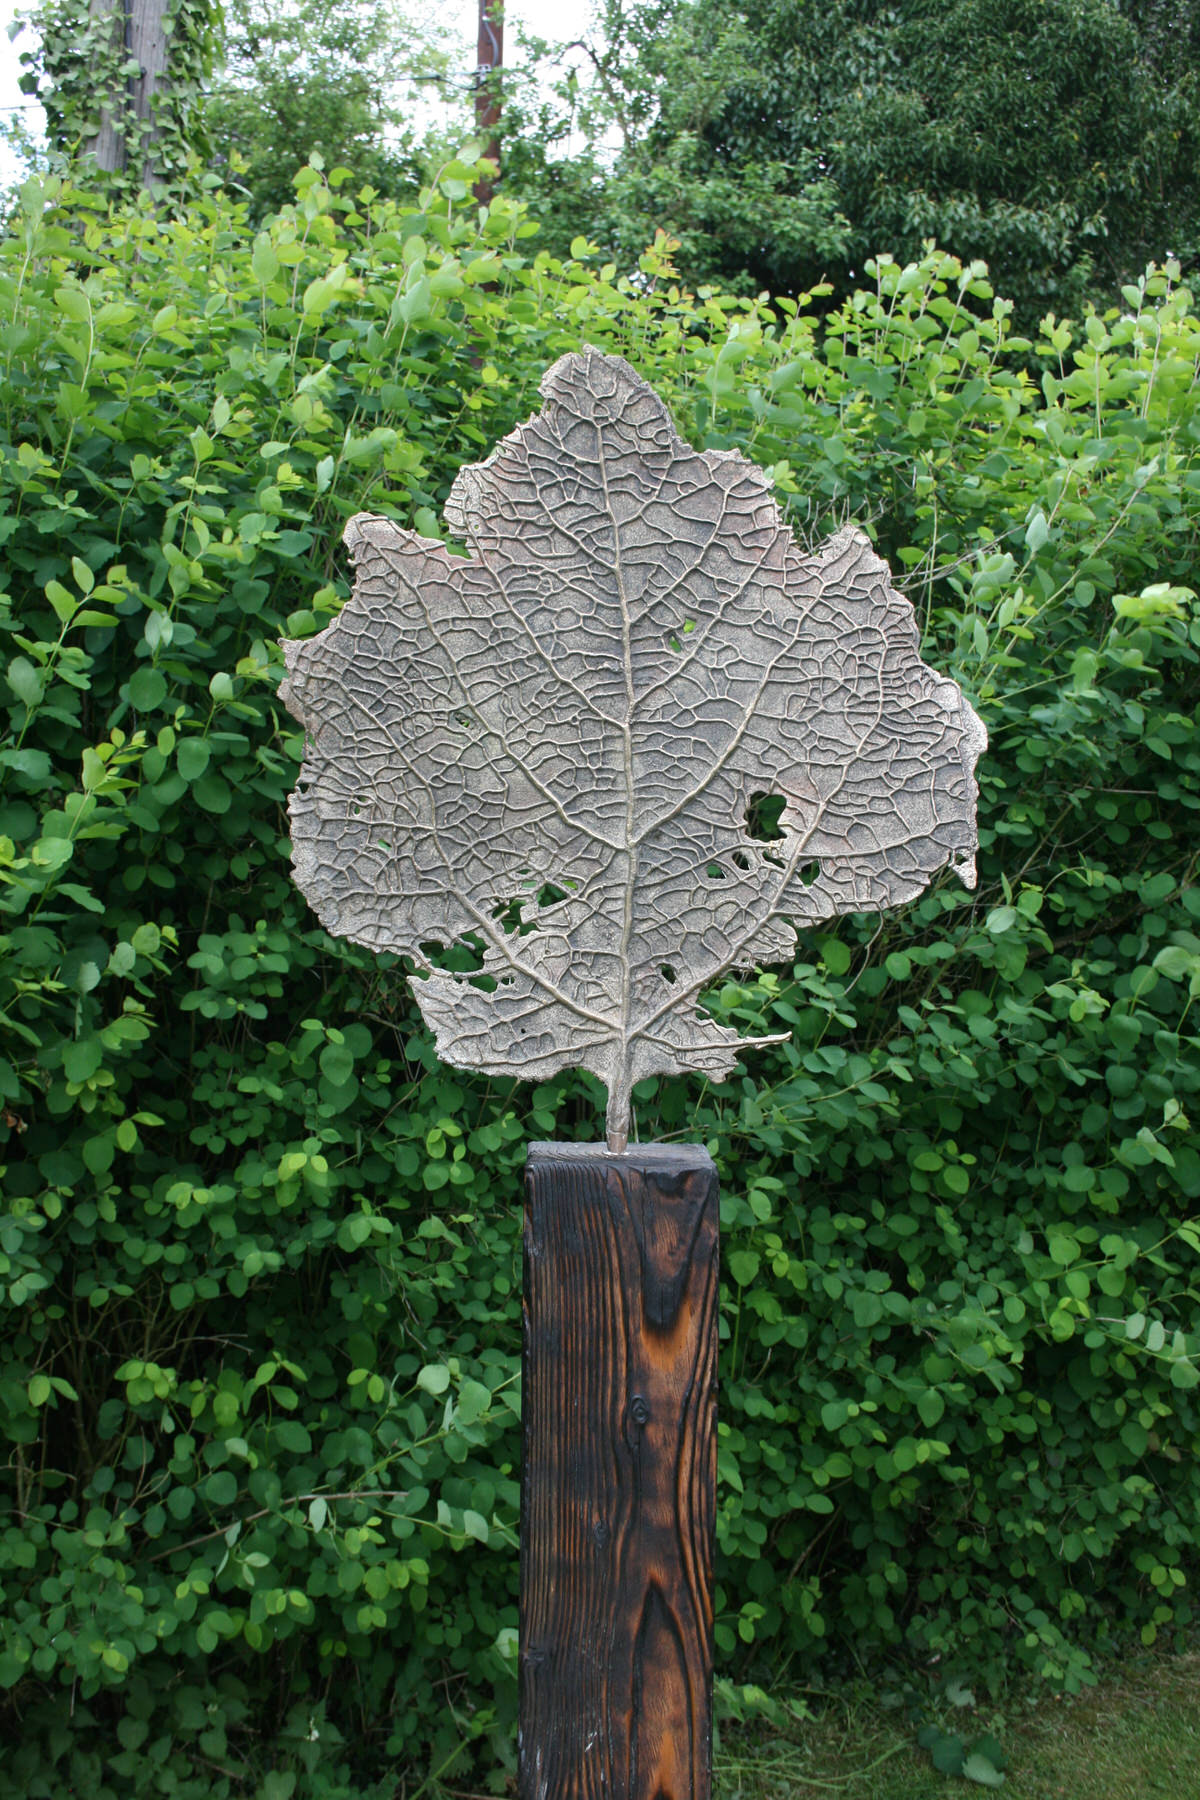 Skeleton Leaf Bronze sculpture by Mark Reed garden sculpture